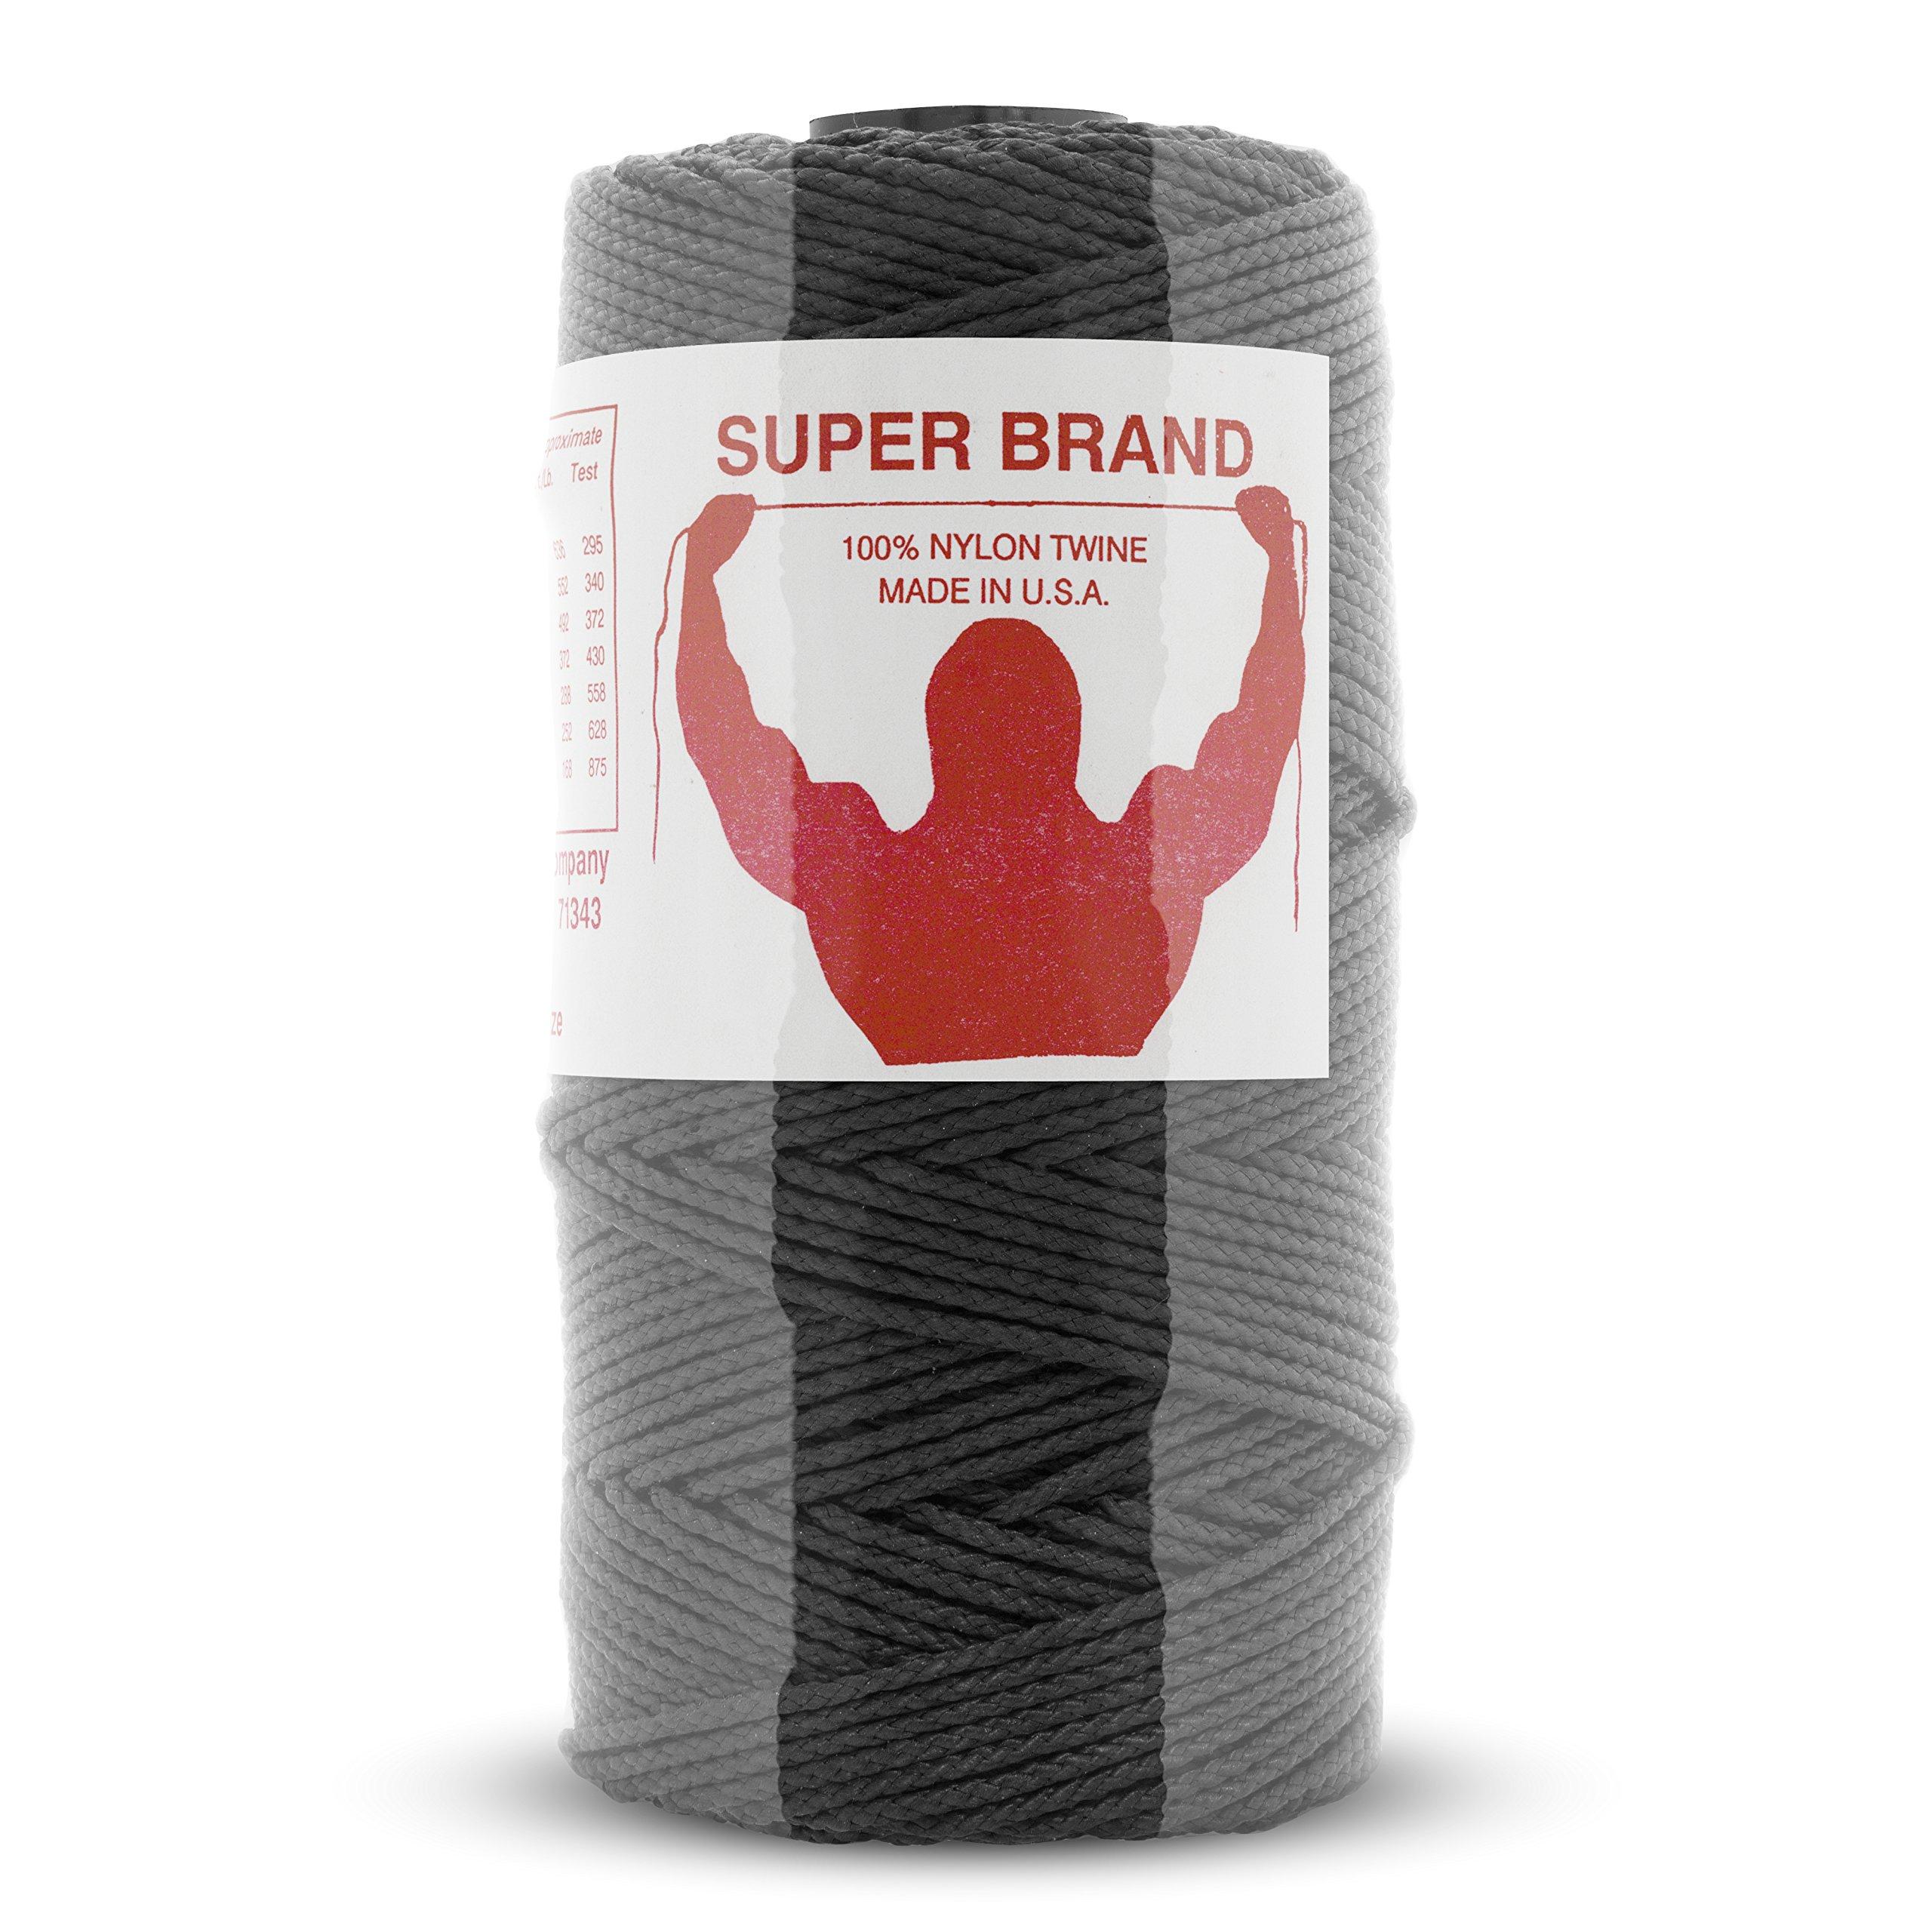 Tarred (Black) Nylon Twine, Braided. Size #48, 1 lb 1-pack